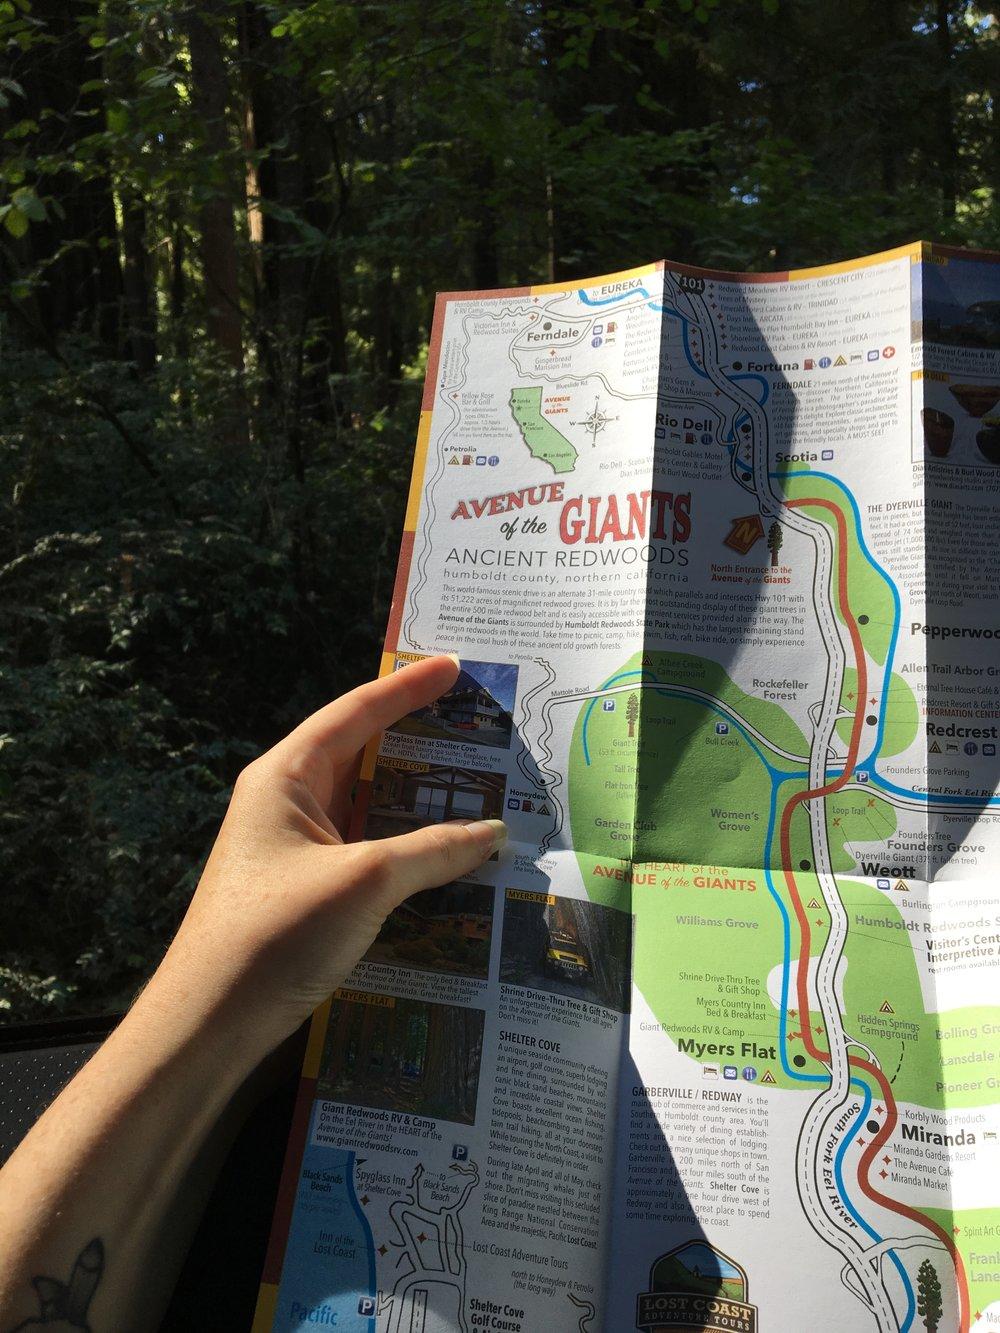 Avenue of the Giants Map.jpg